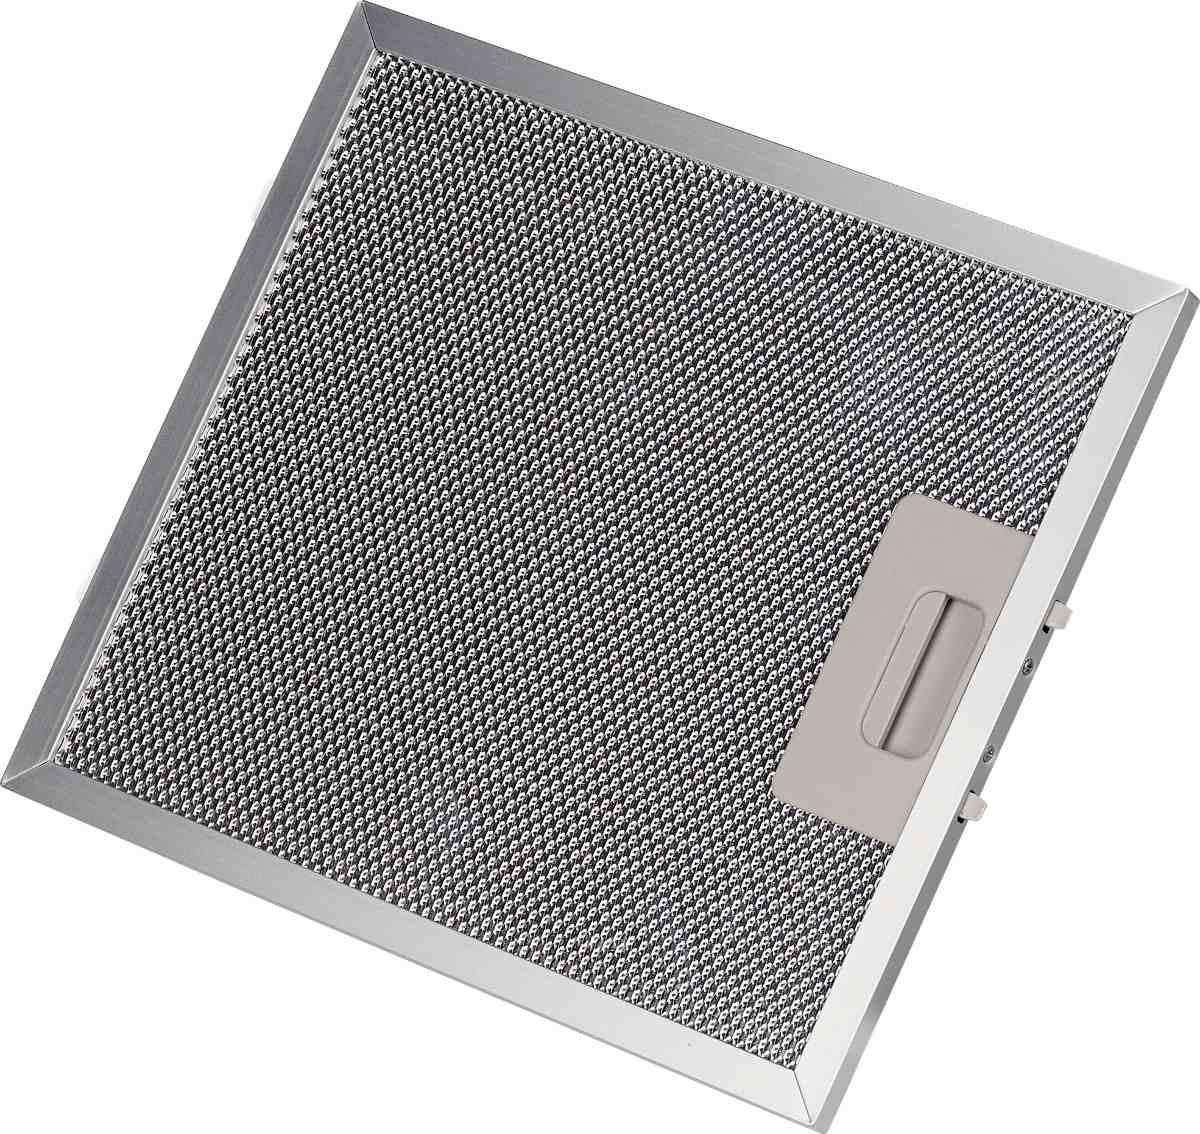 Kit Filtro Alumínio + Filtro Carvão Coifa Tramontina Vetro